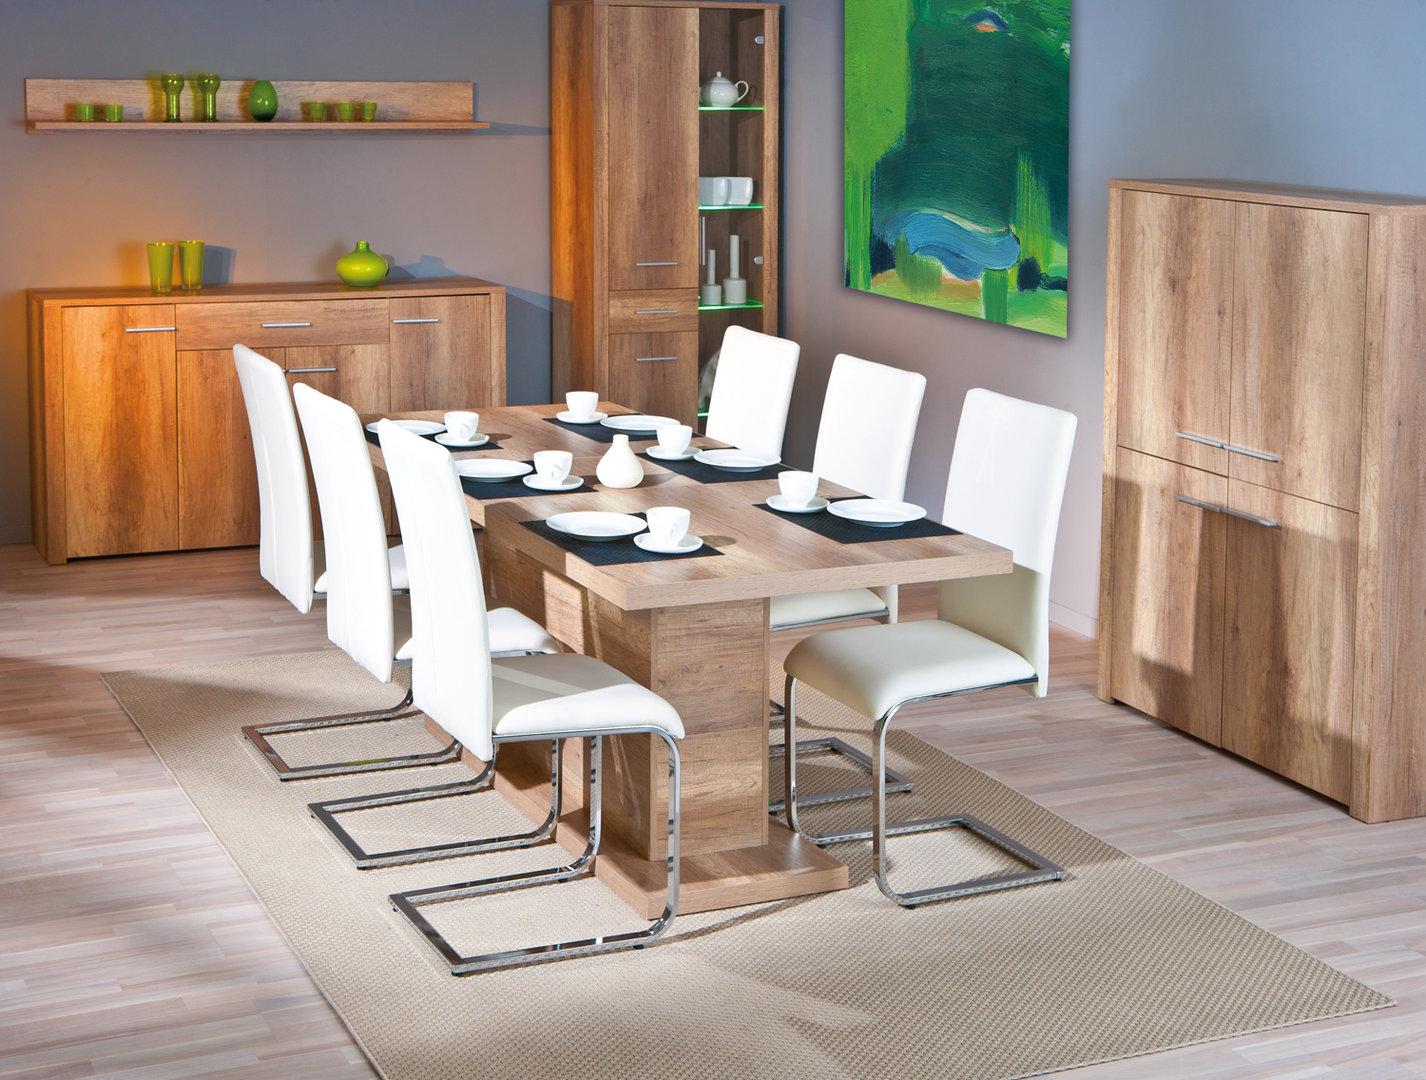 Sedia Moderna Nancy Sedie Per Ufficio Tavolo Da Pranzo Di Design #A45F27 1426 1080 Sedie Sala Da Pranzo Design